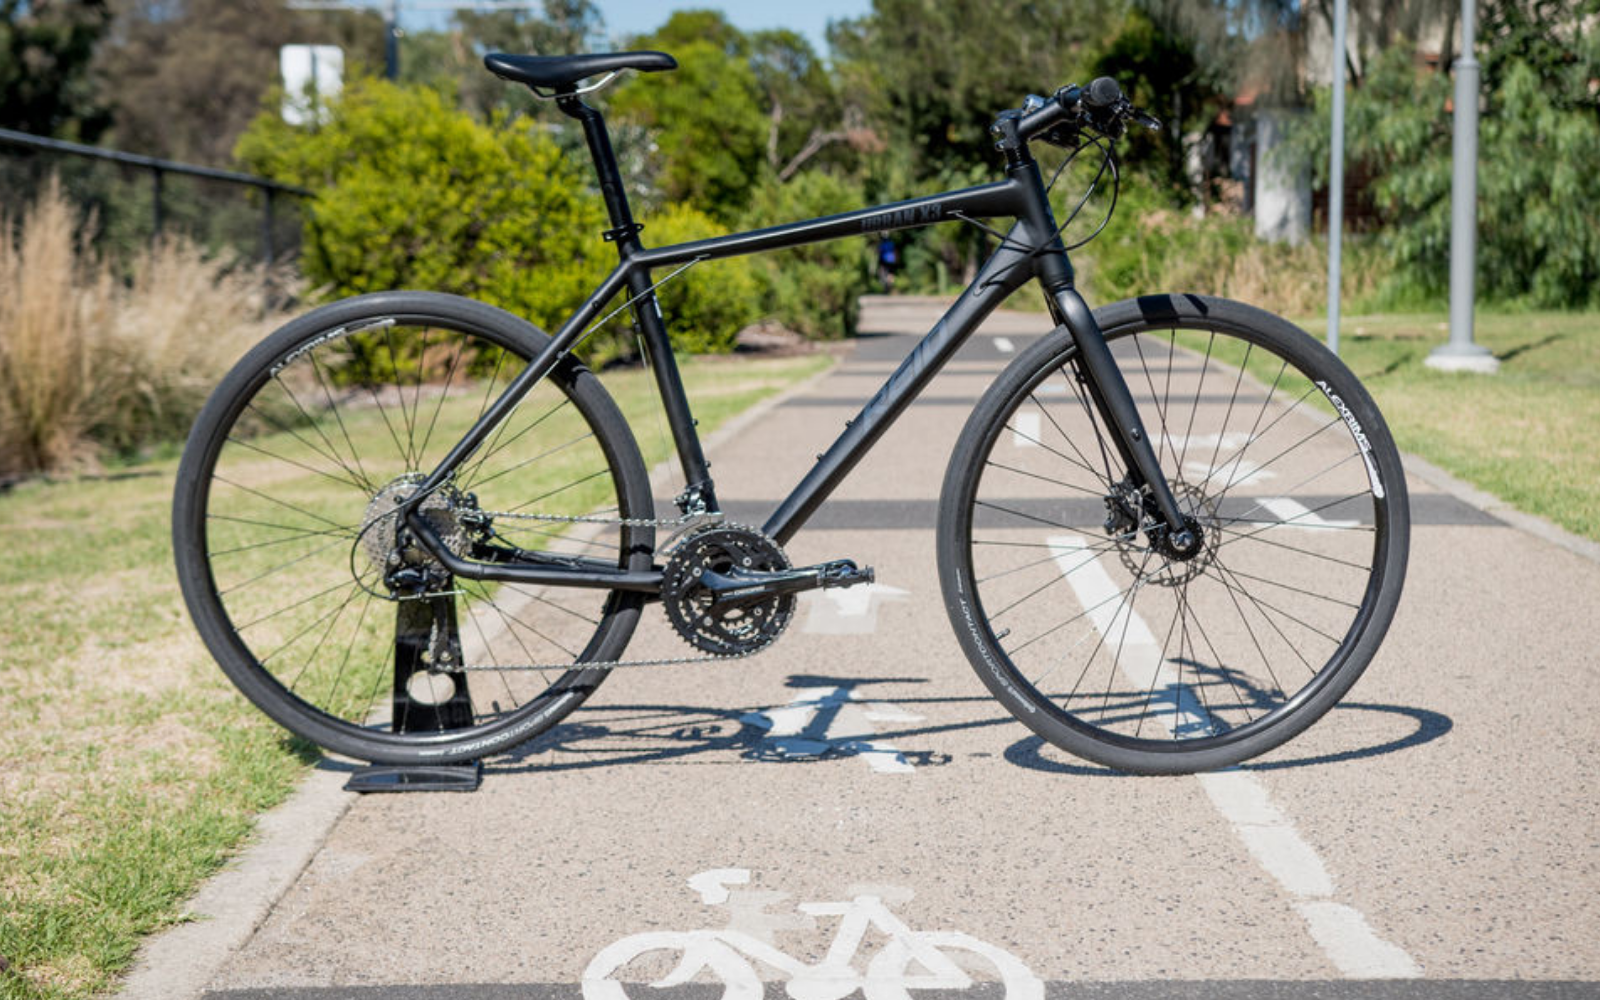 100 1 - Reid ® - Urban X3 Bike